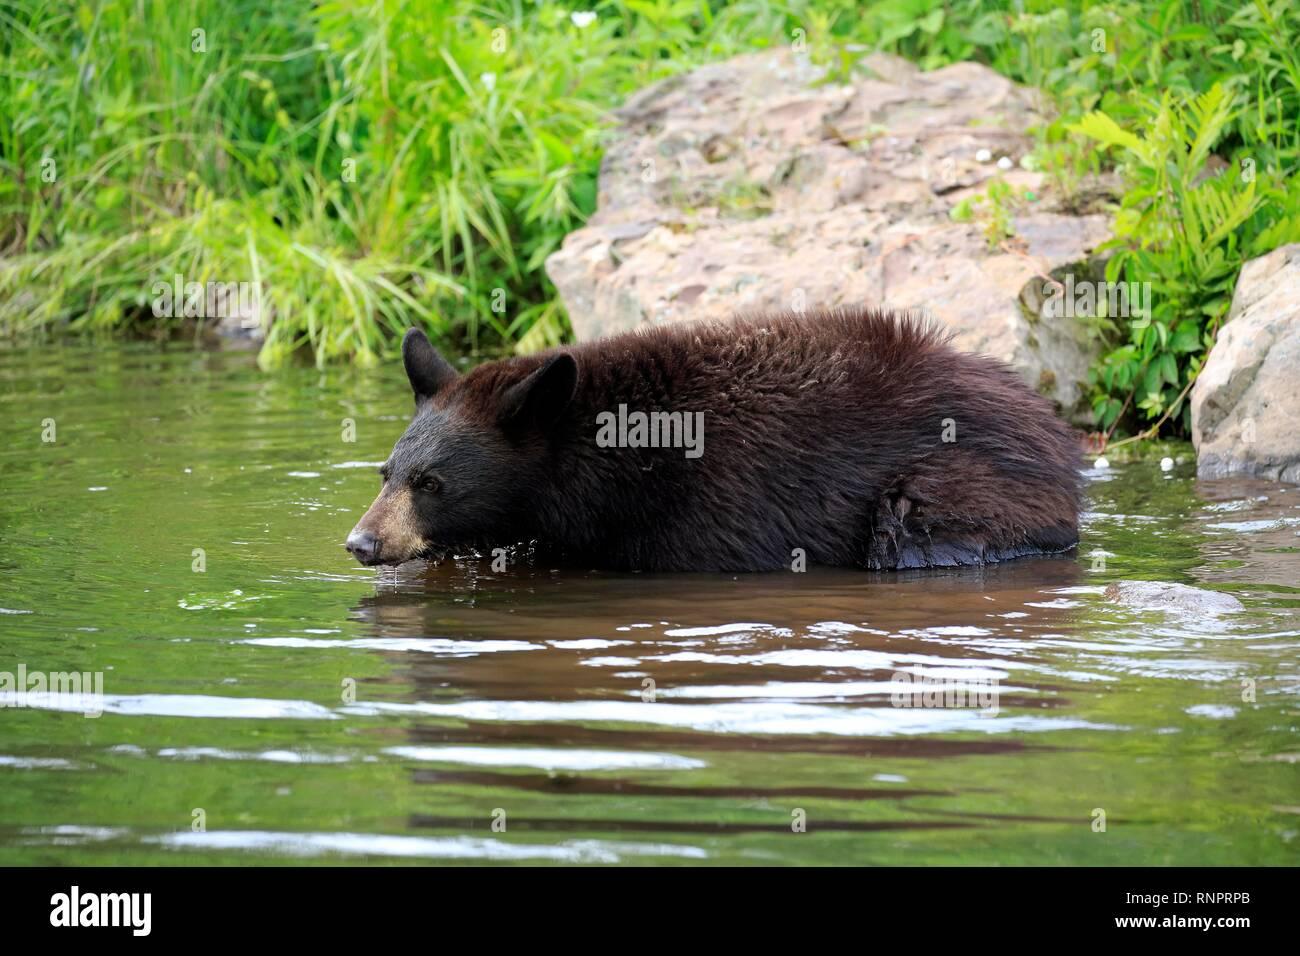 American Black Bear (Ursus americanus), young animal in water, Pine County, Minnesota, USA Stock Photo